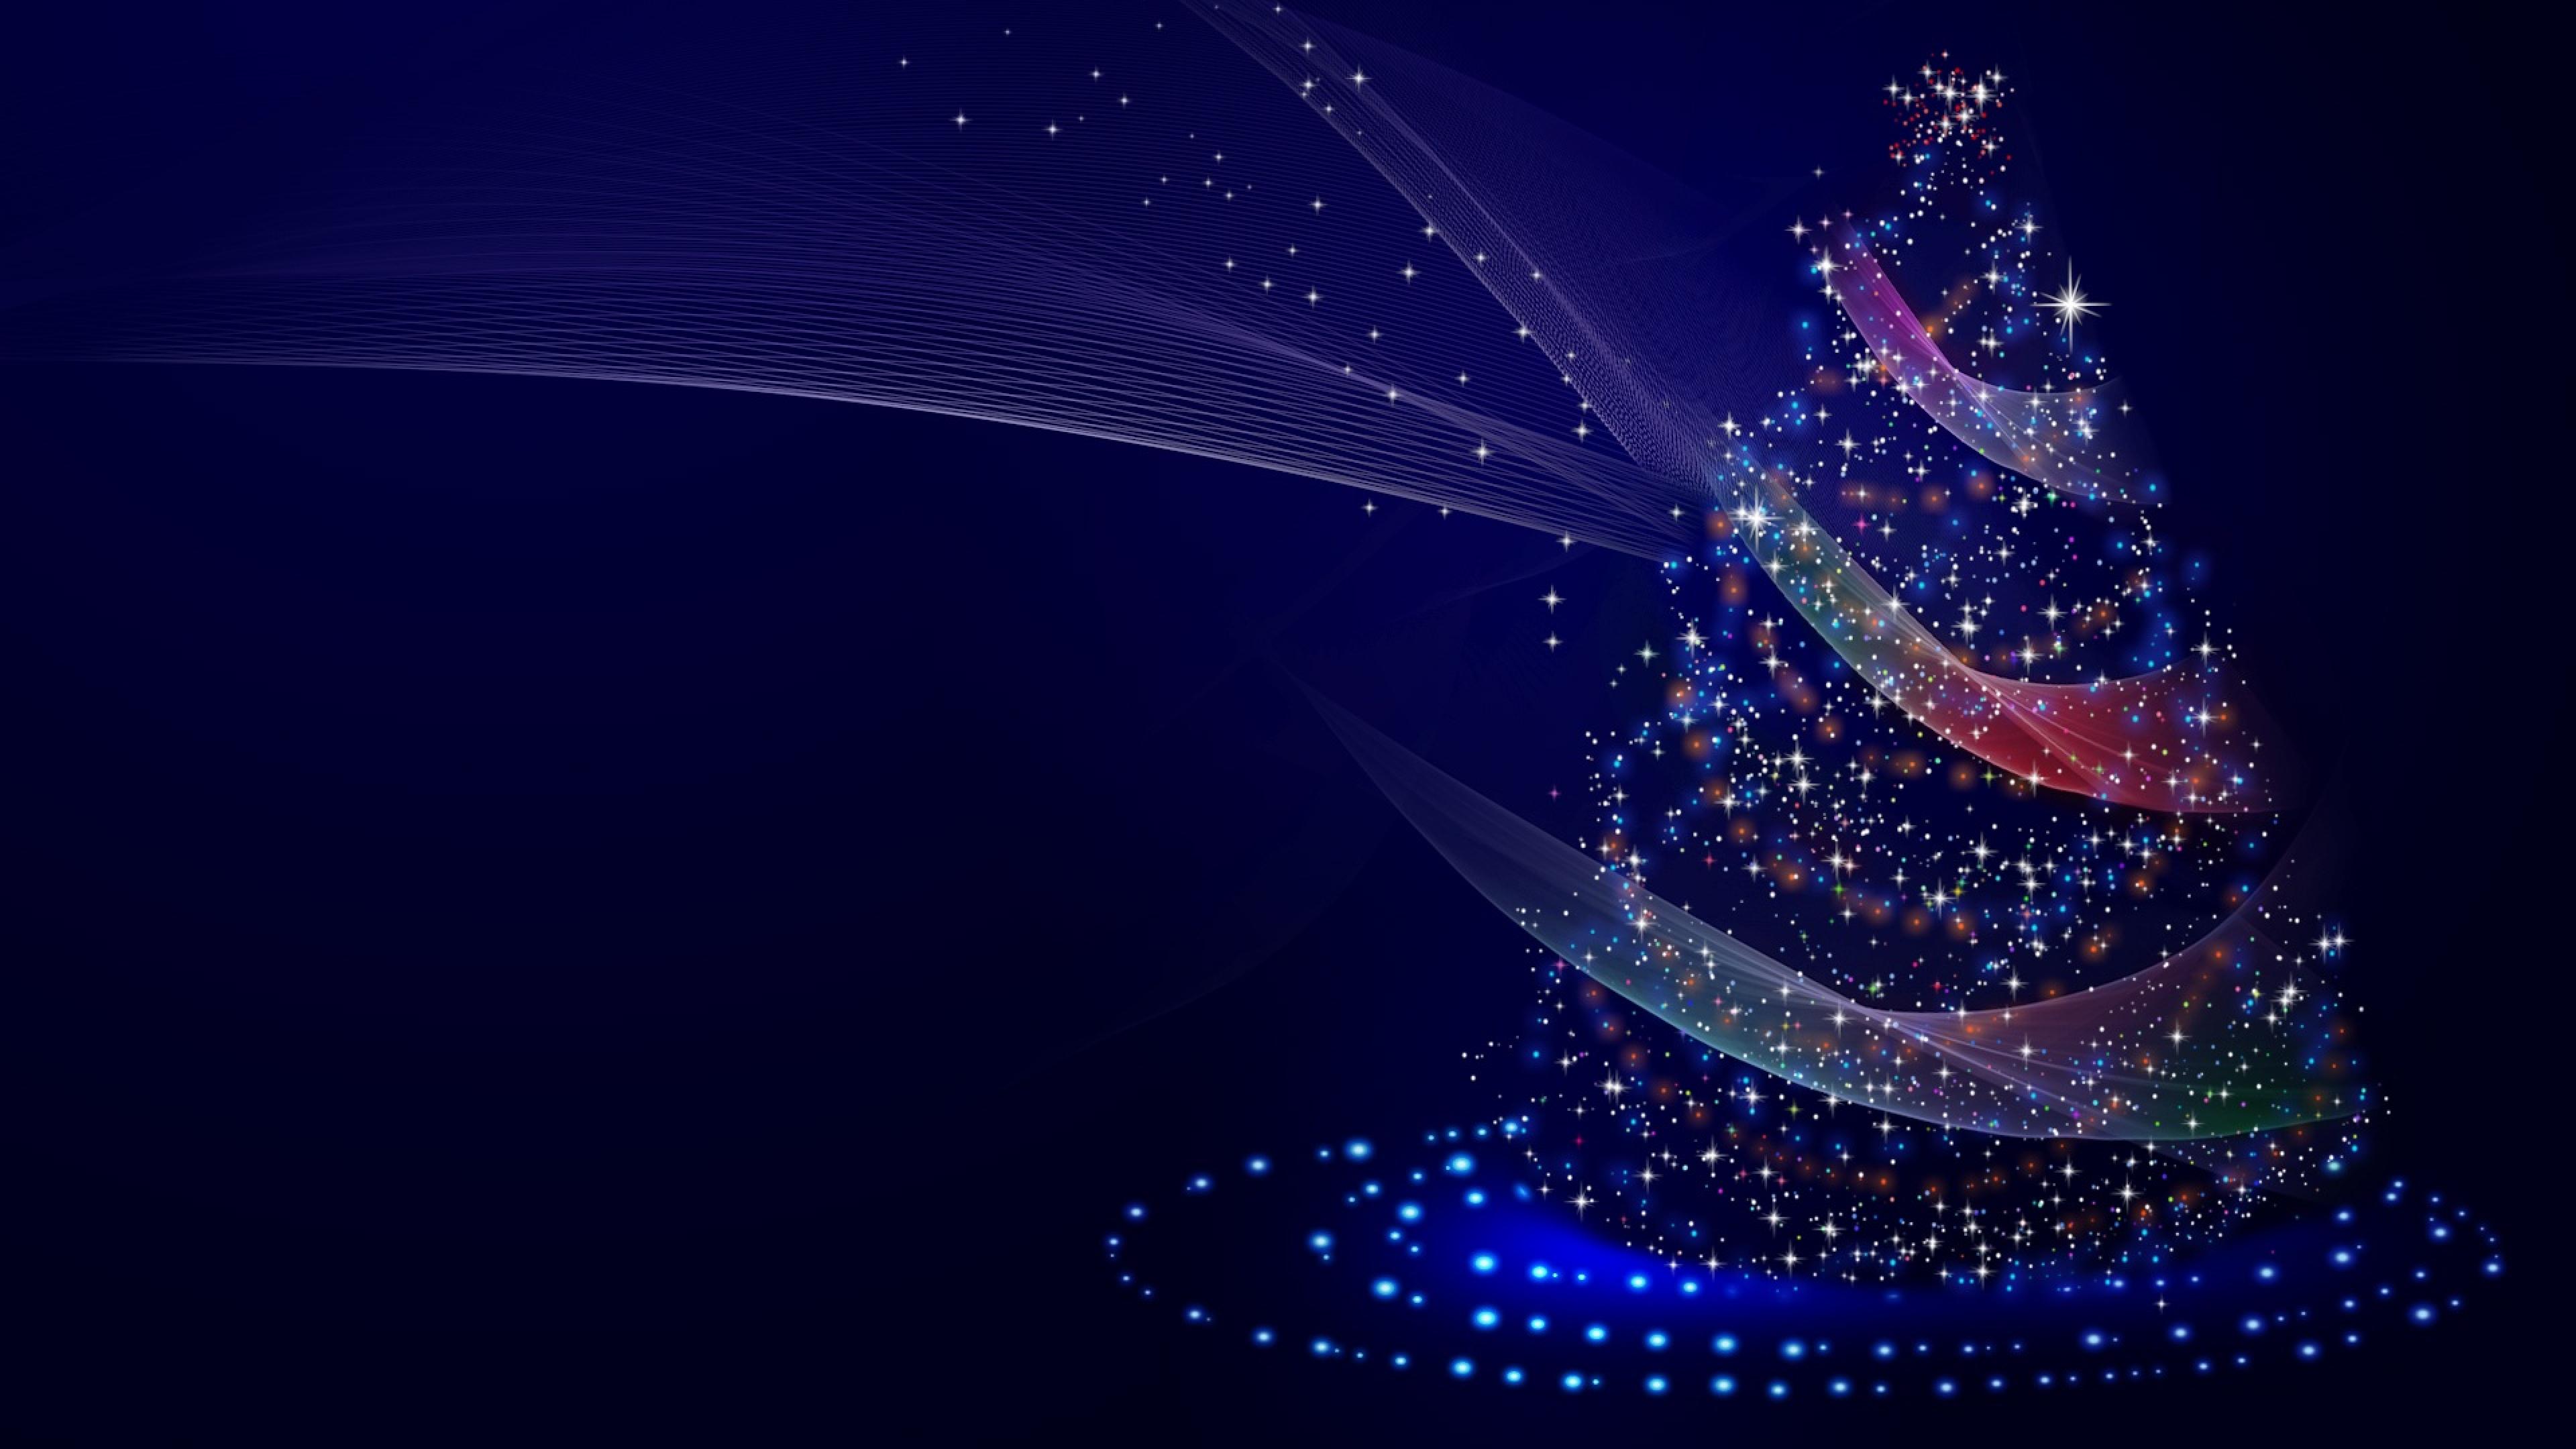 Download Artistic Blue Christmas Tree 240x320 Resolution